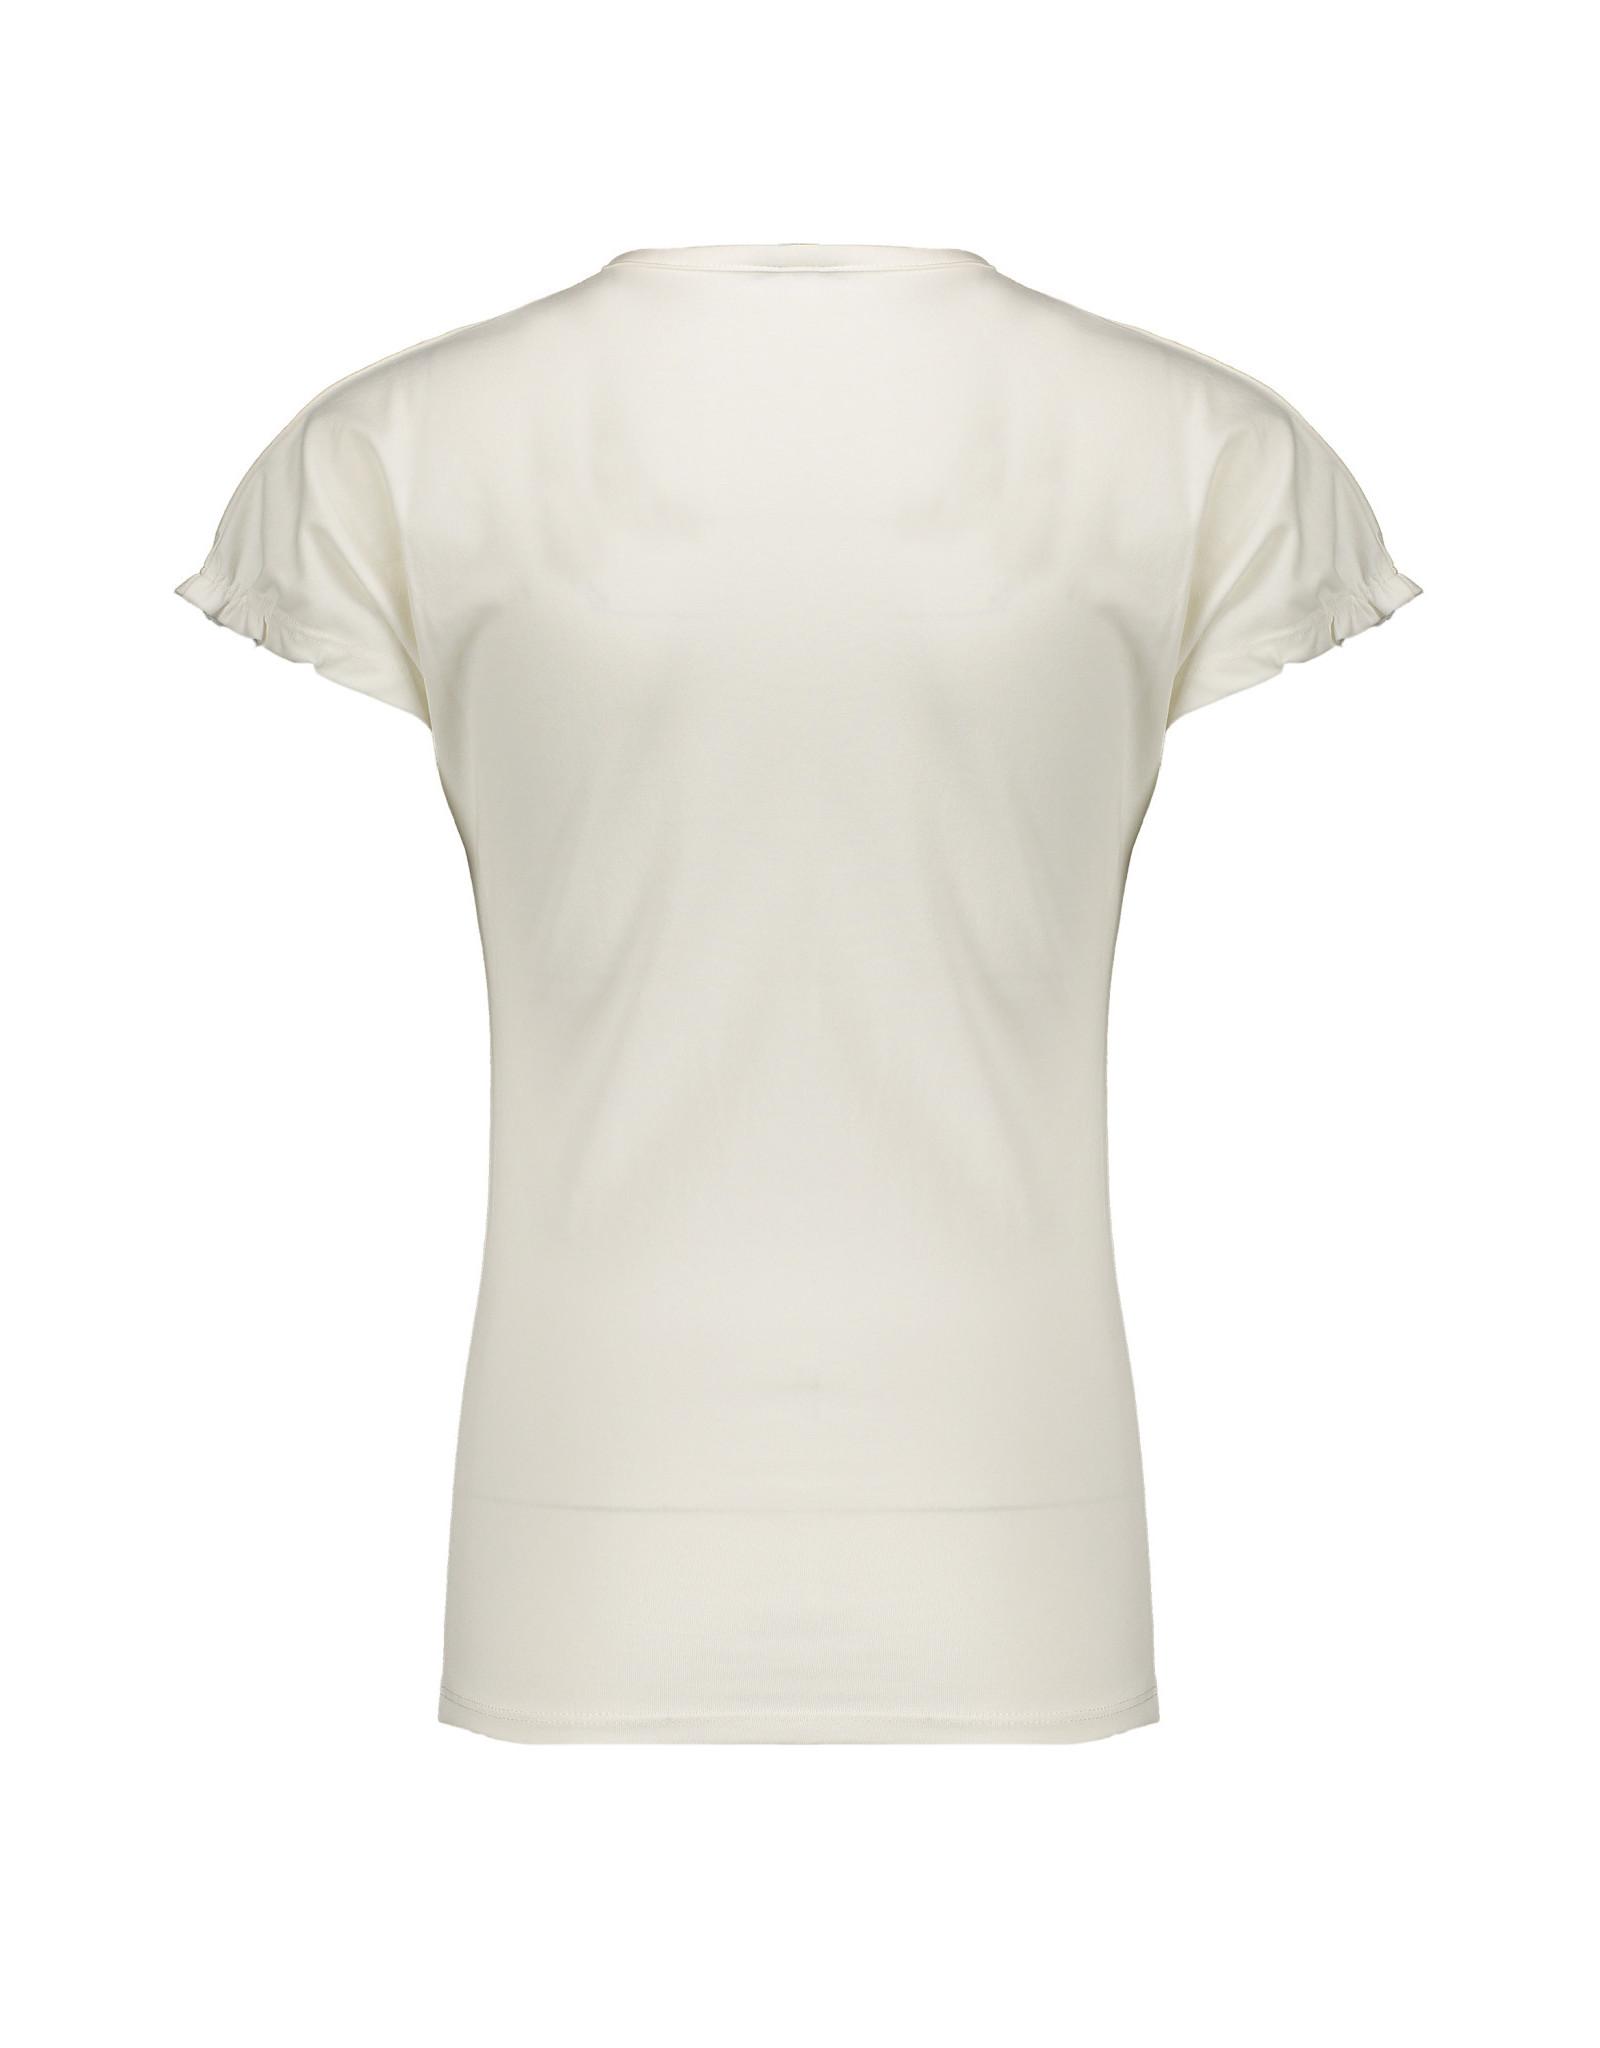 NoBell meiden t-shirt Holiday Kaka Grey Navy